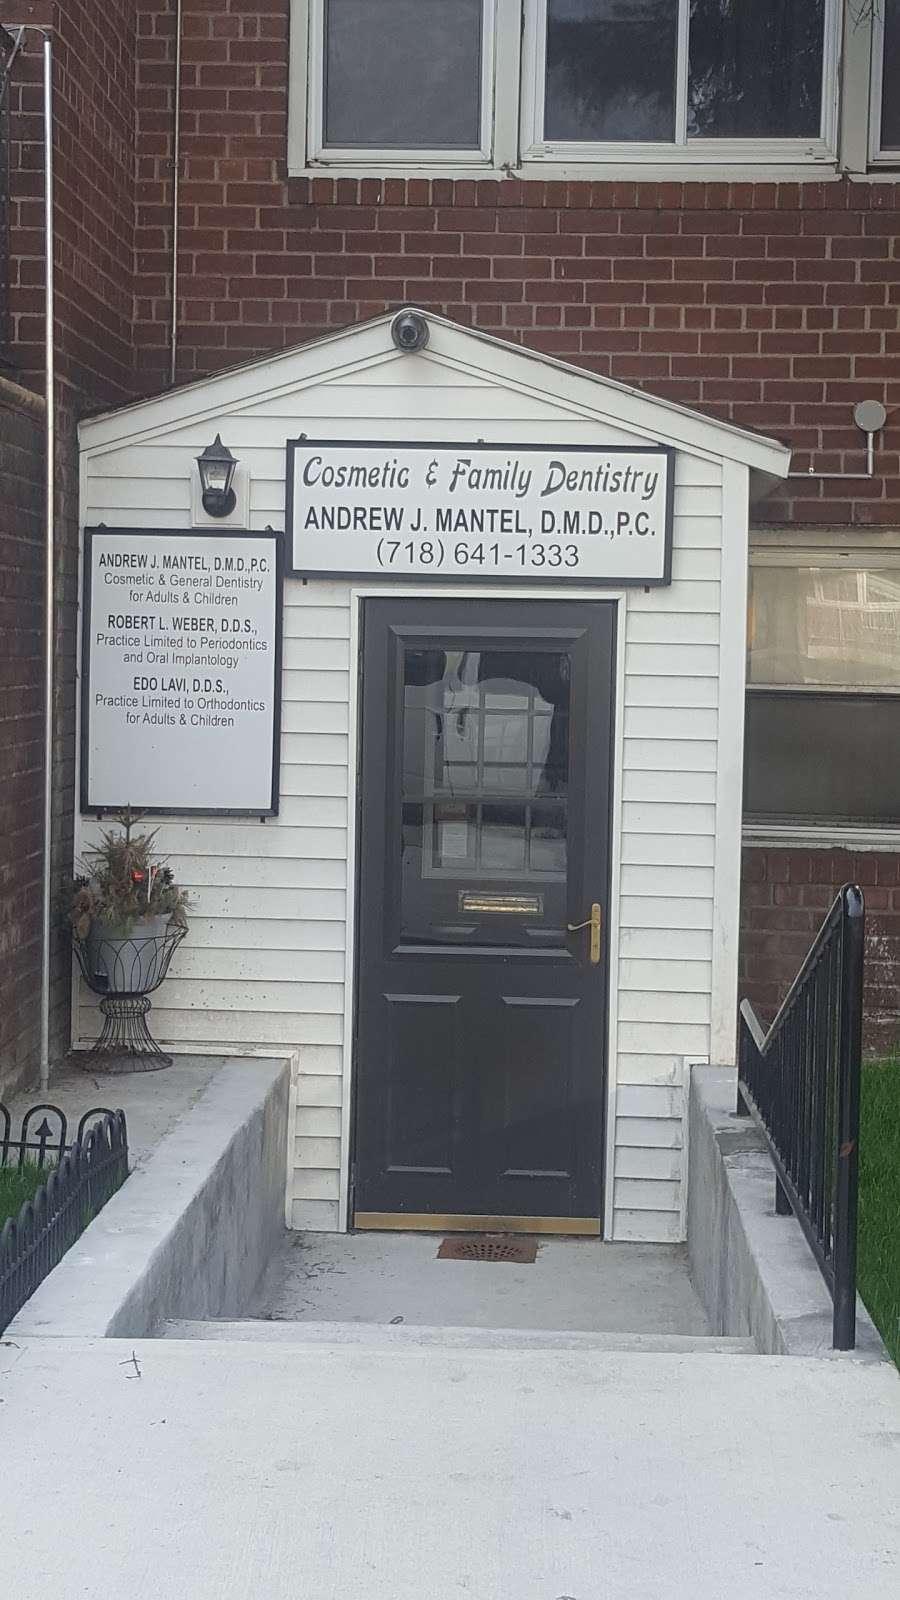 Mantel Andrew J DDS - dentist  | Photo 1 of 3 | Address: 150-9 89th St, Howard Beach, NY 11414, USA | Phone: (718) 641-1333